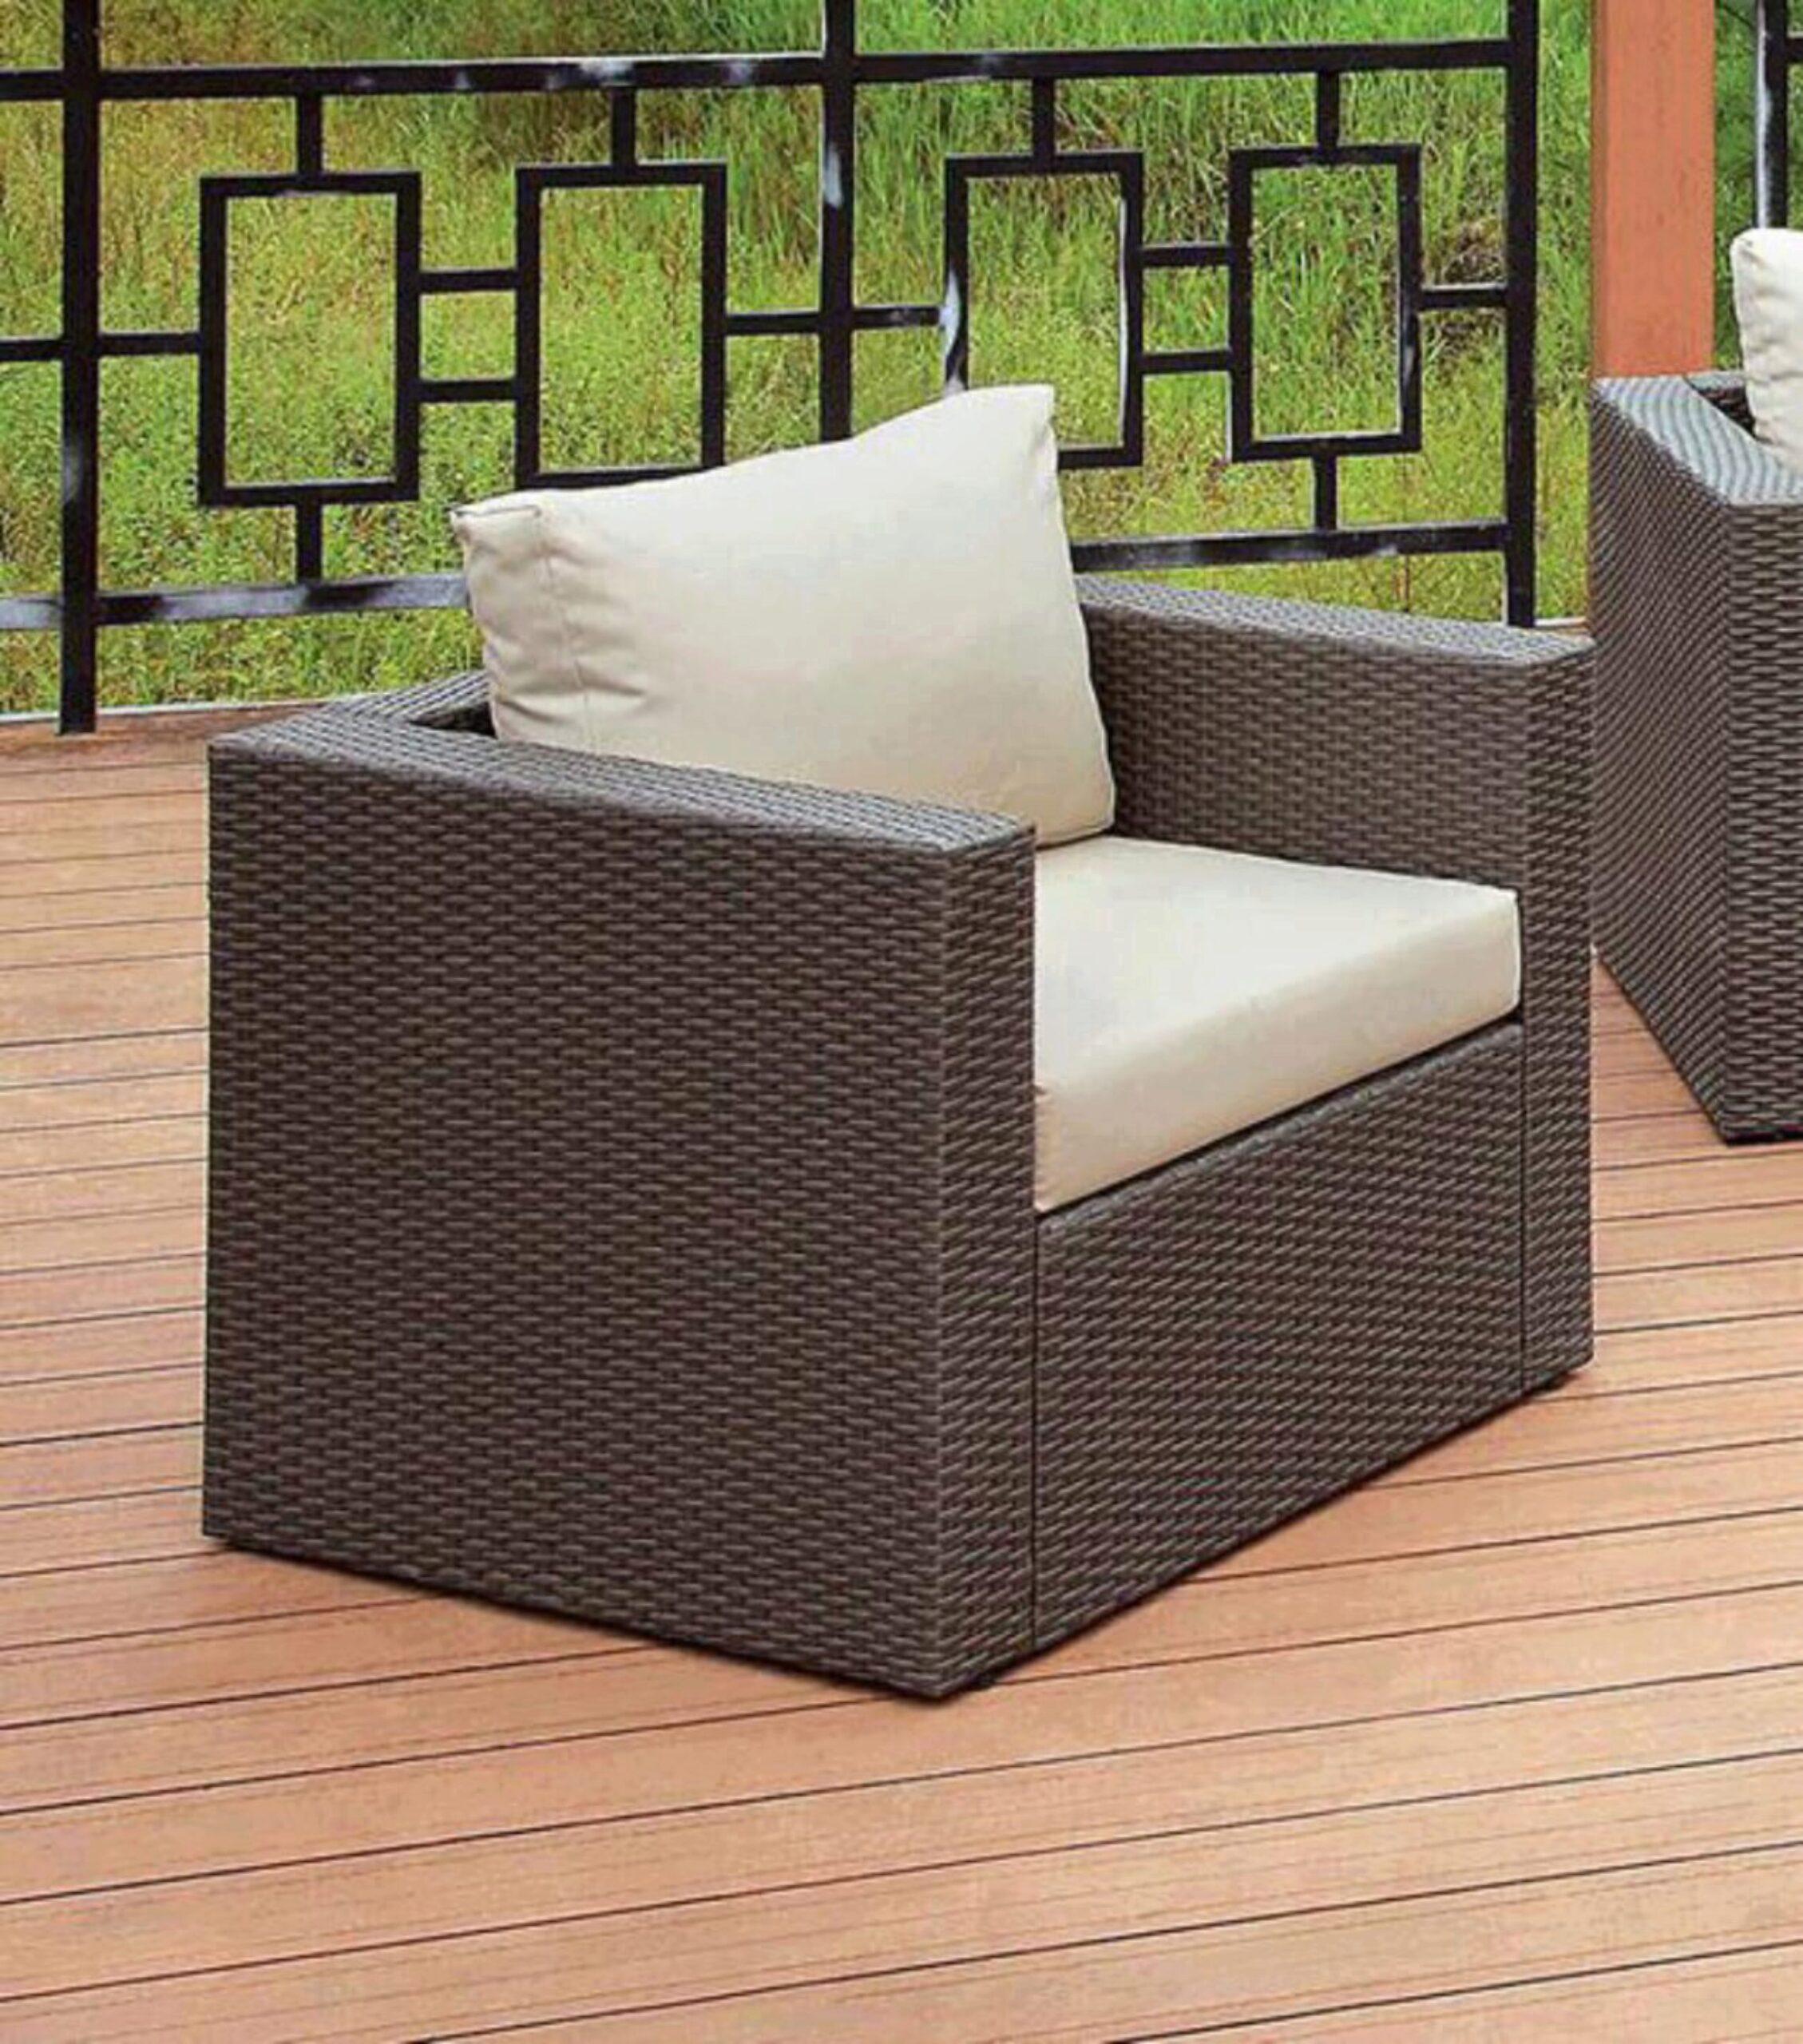 furniture of america davina brown wicker patio sectional w ottoman storage set 6 pcs